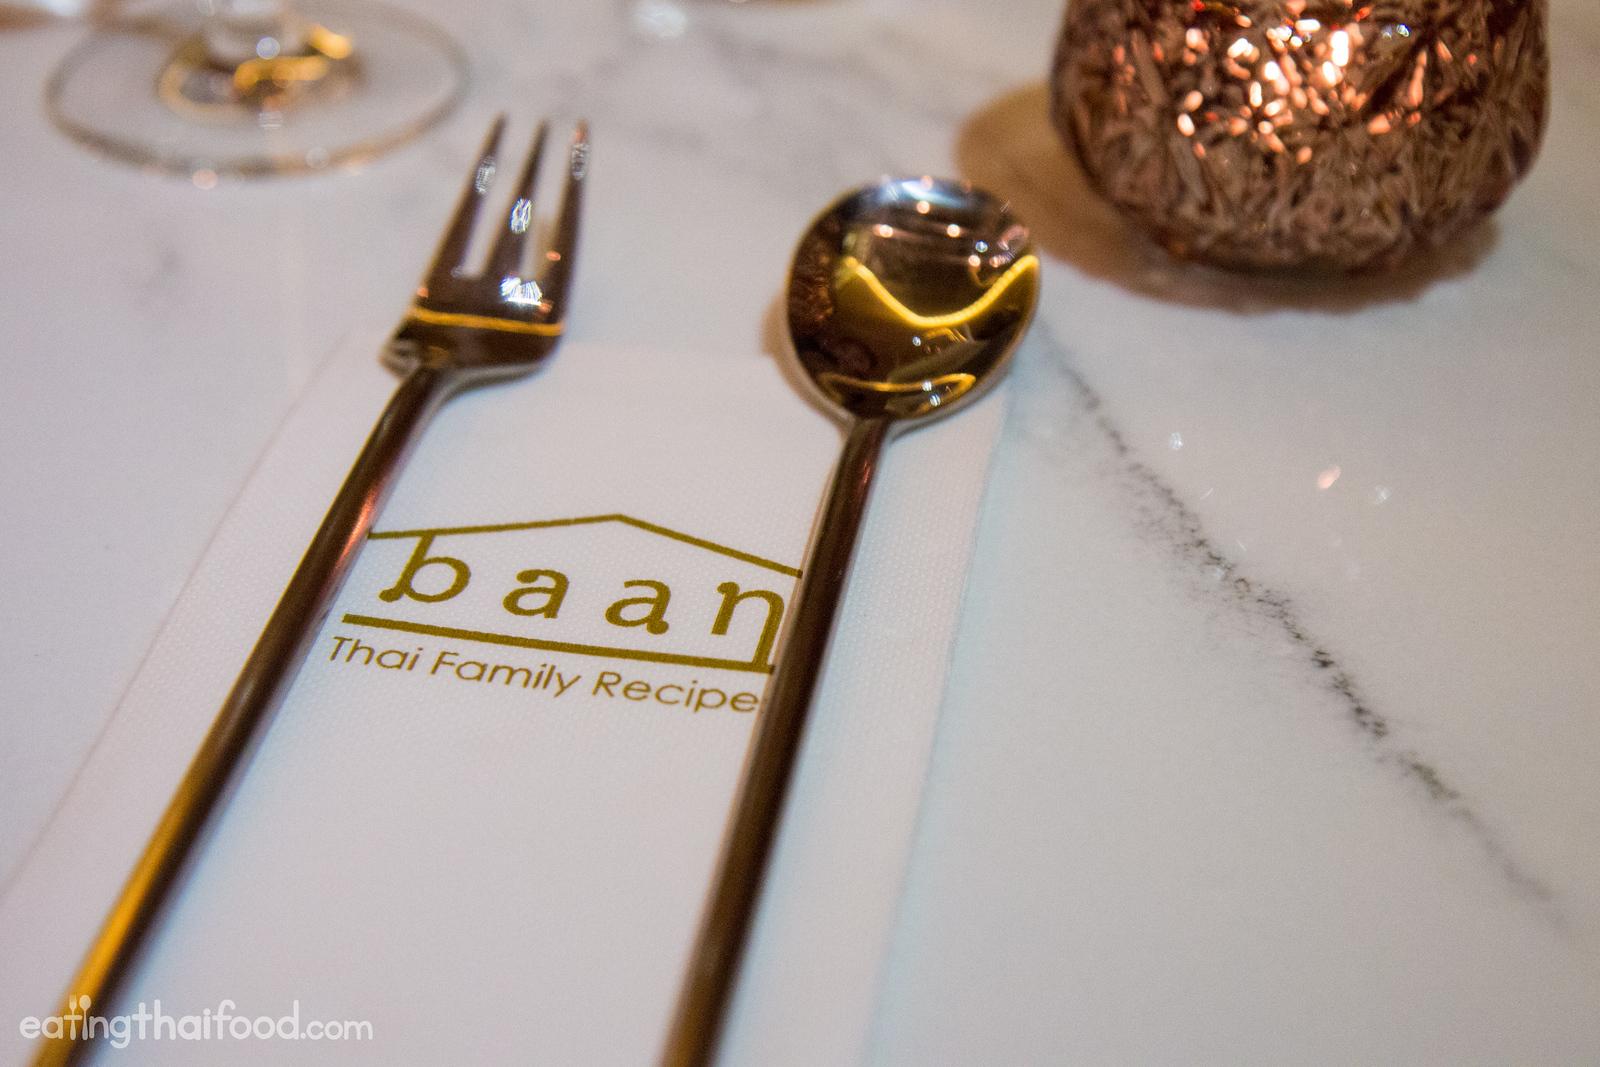 Baan Thai Family Recipes - Bangkok restaurant